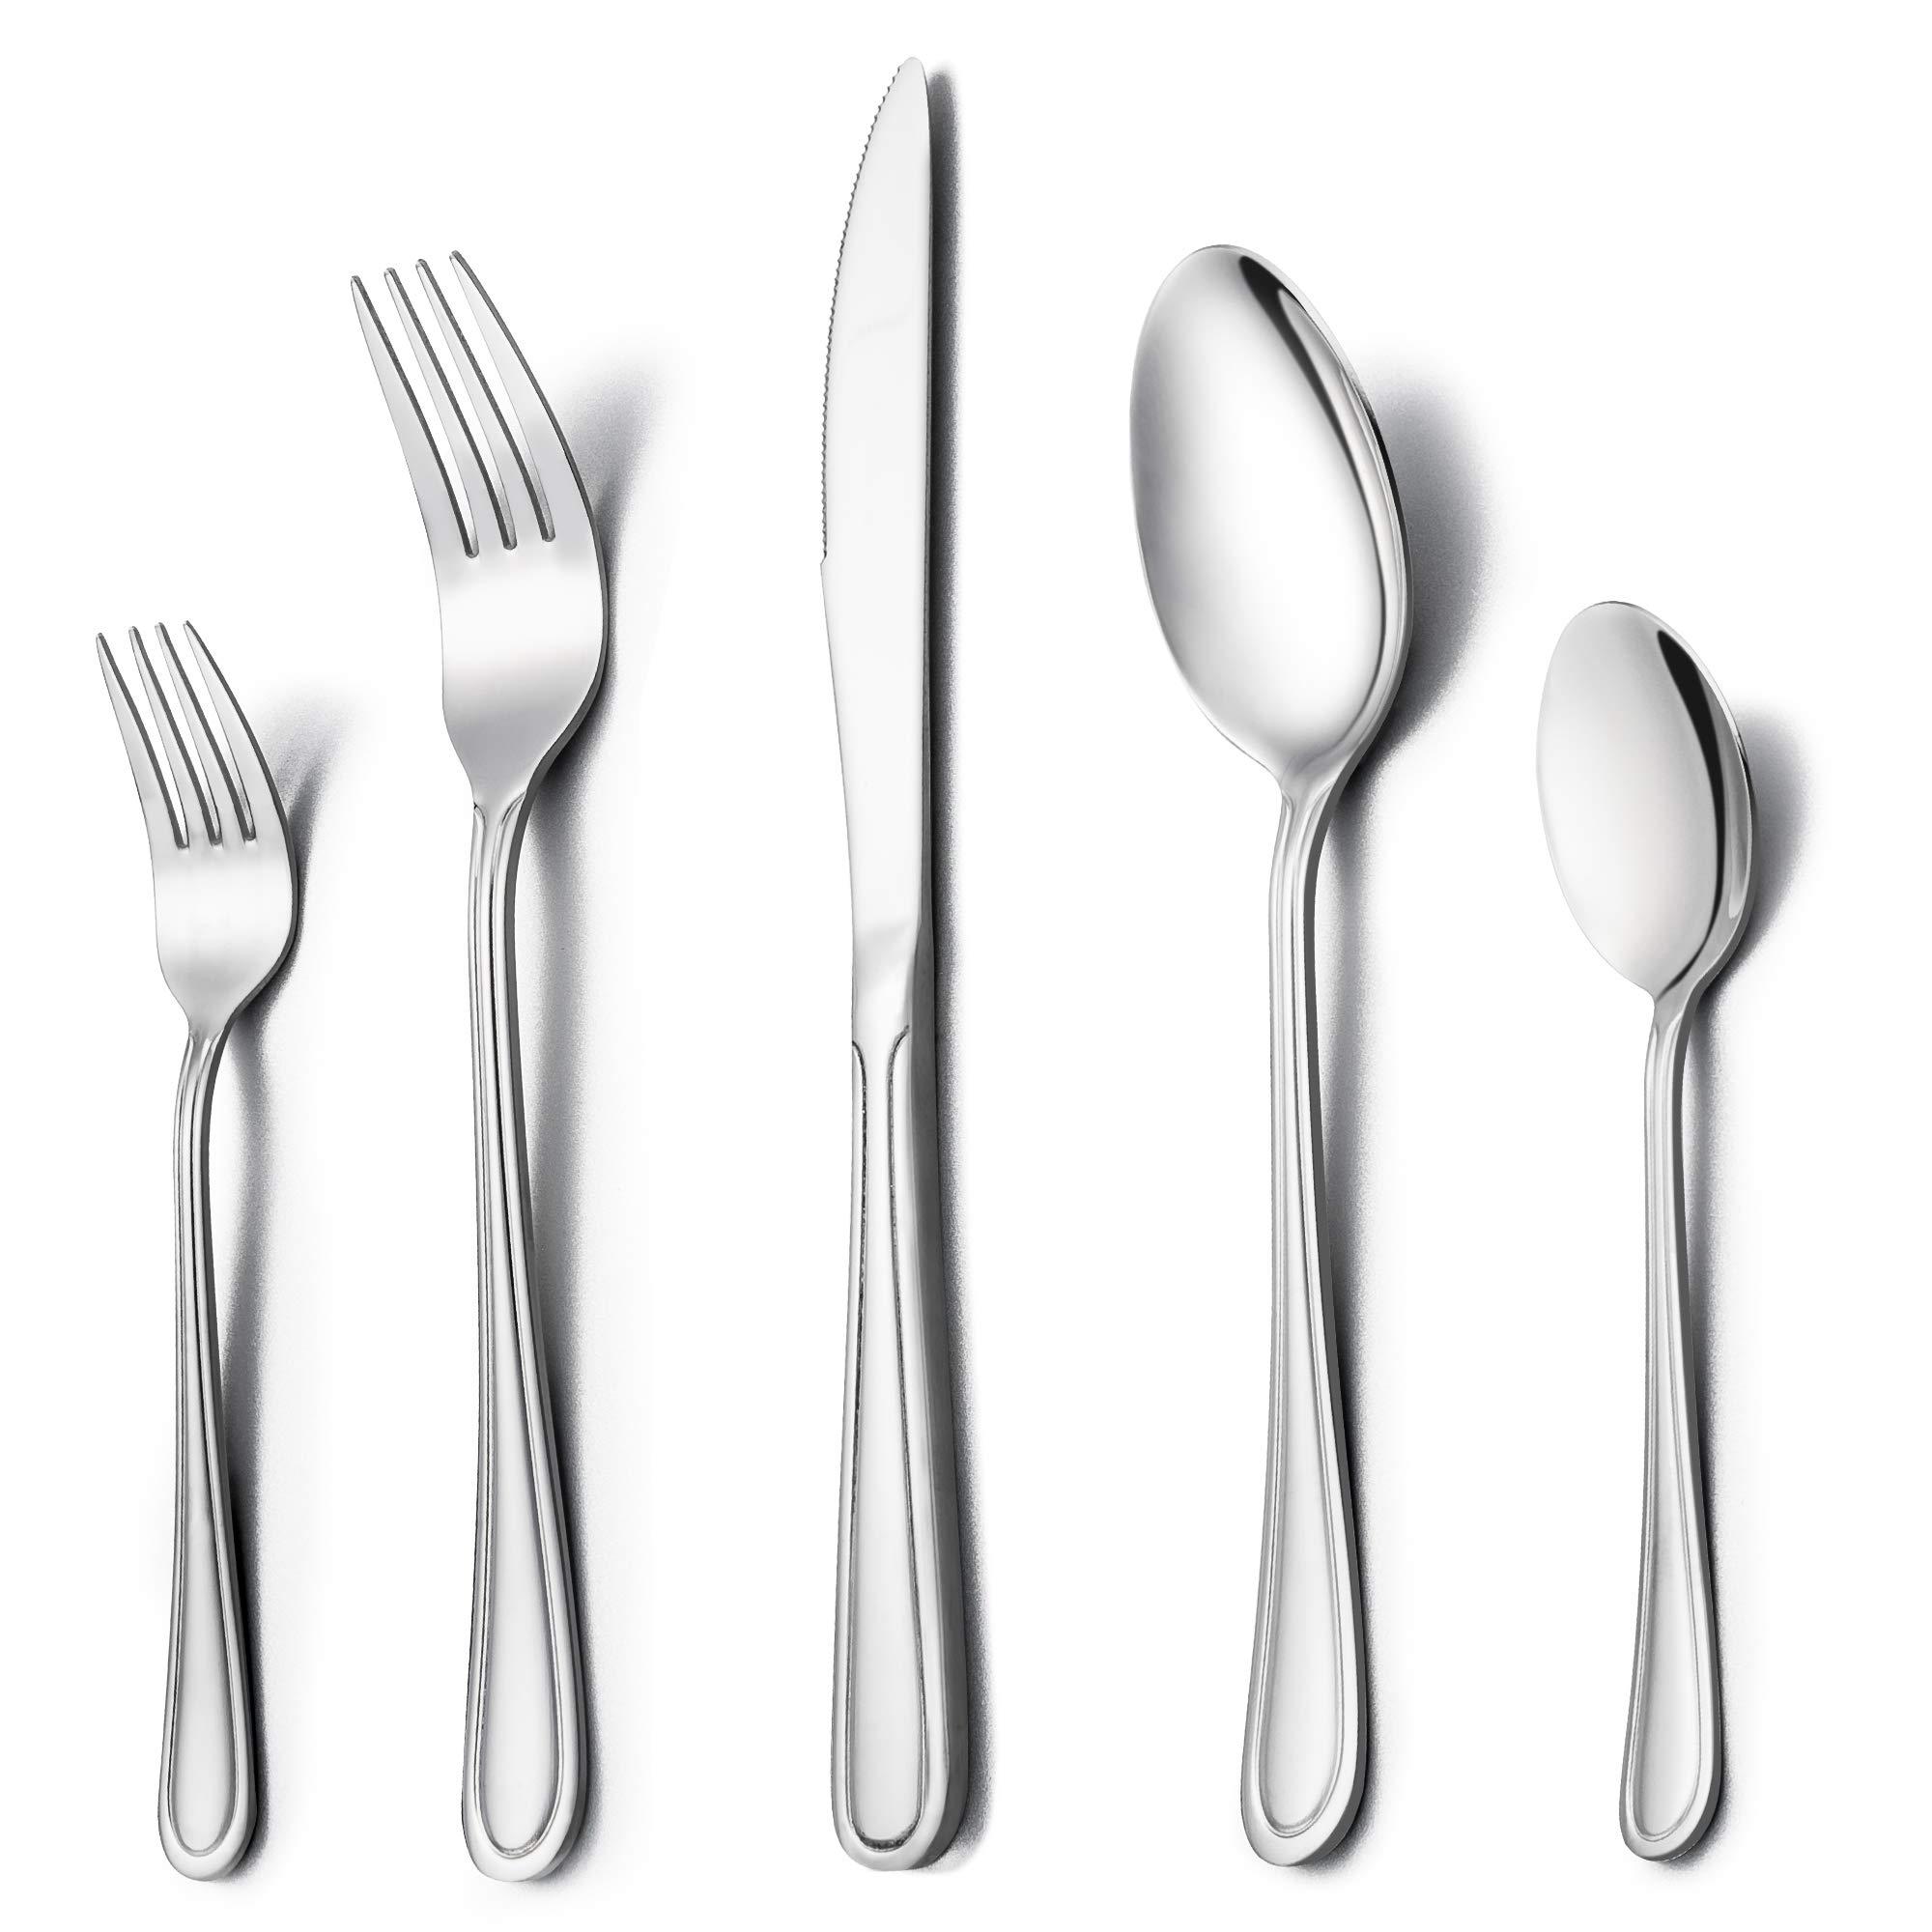 LIANYU 20-Piece Silverware Set, Stainless Steel Flatware Utensil Set for Home Kitchen Restaurant Hotel, Dishwasher Safe - Service for 4